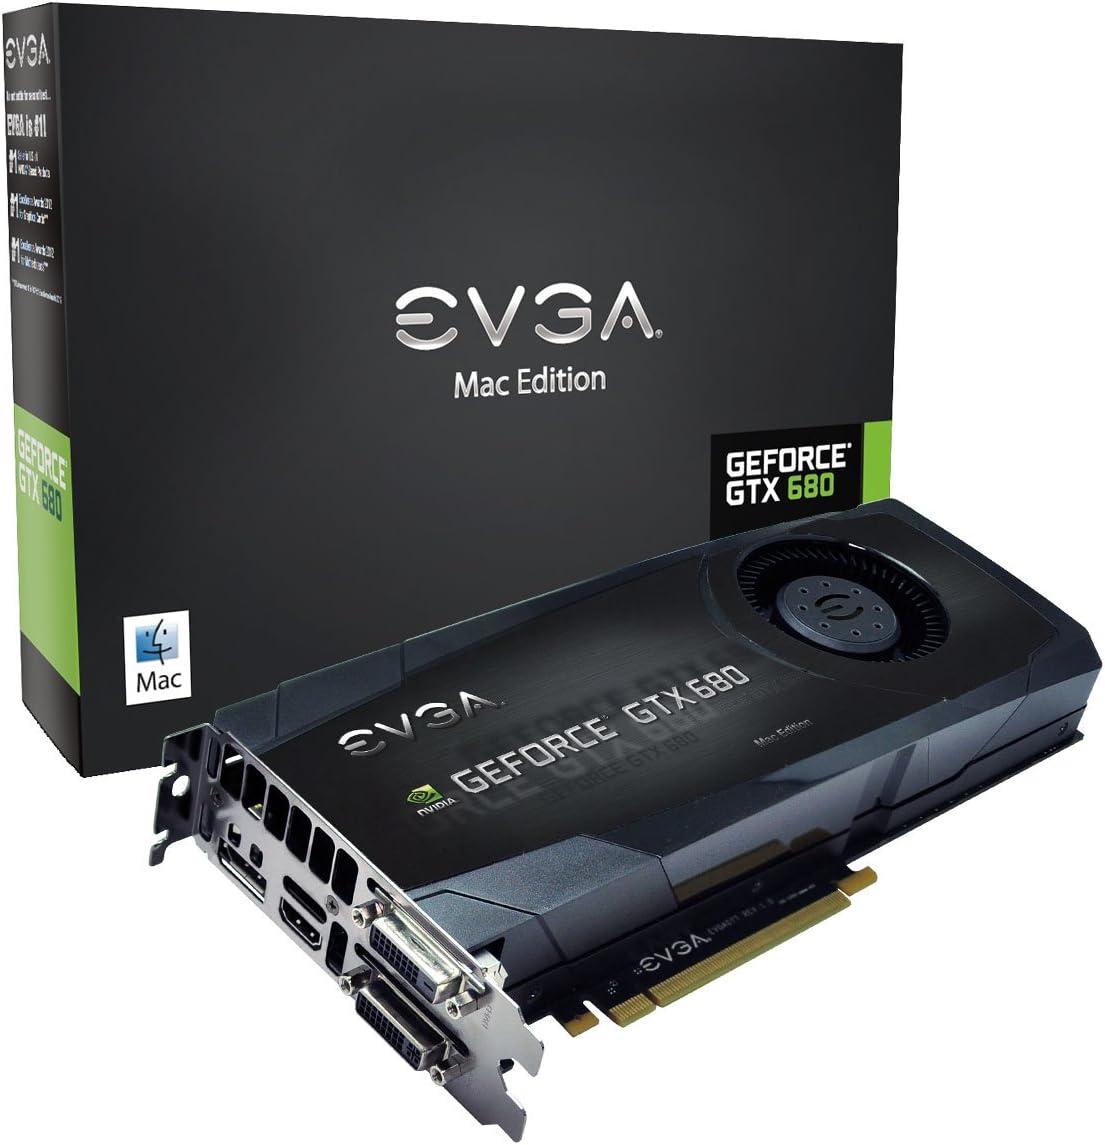 EVGA GeForce GTX680 2GB GDDR5 DisplayPort DVI-I, DVI-D HDMI Graphics Cardfor Mac 02G-P4-3682-KR